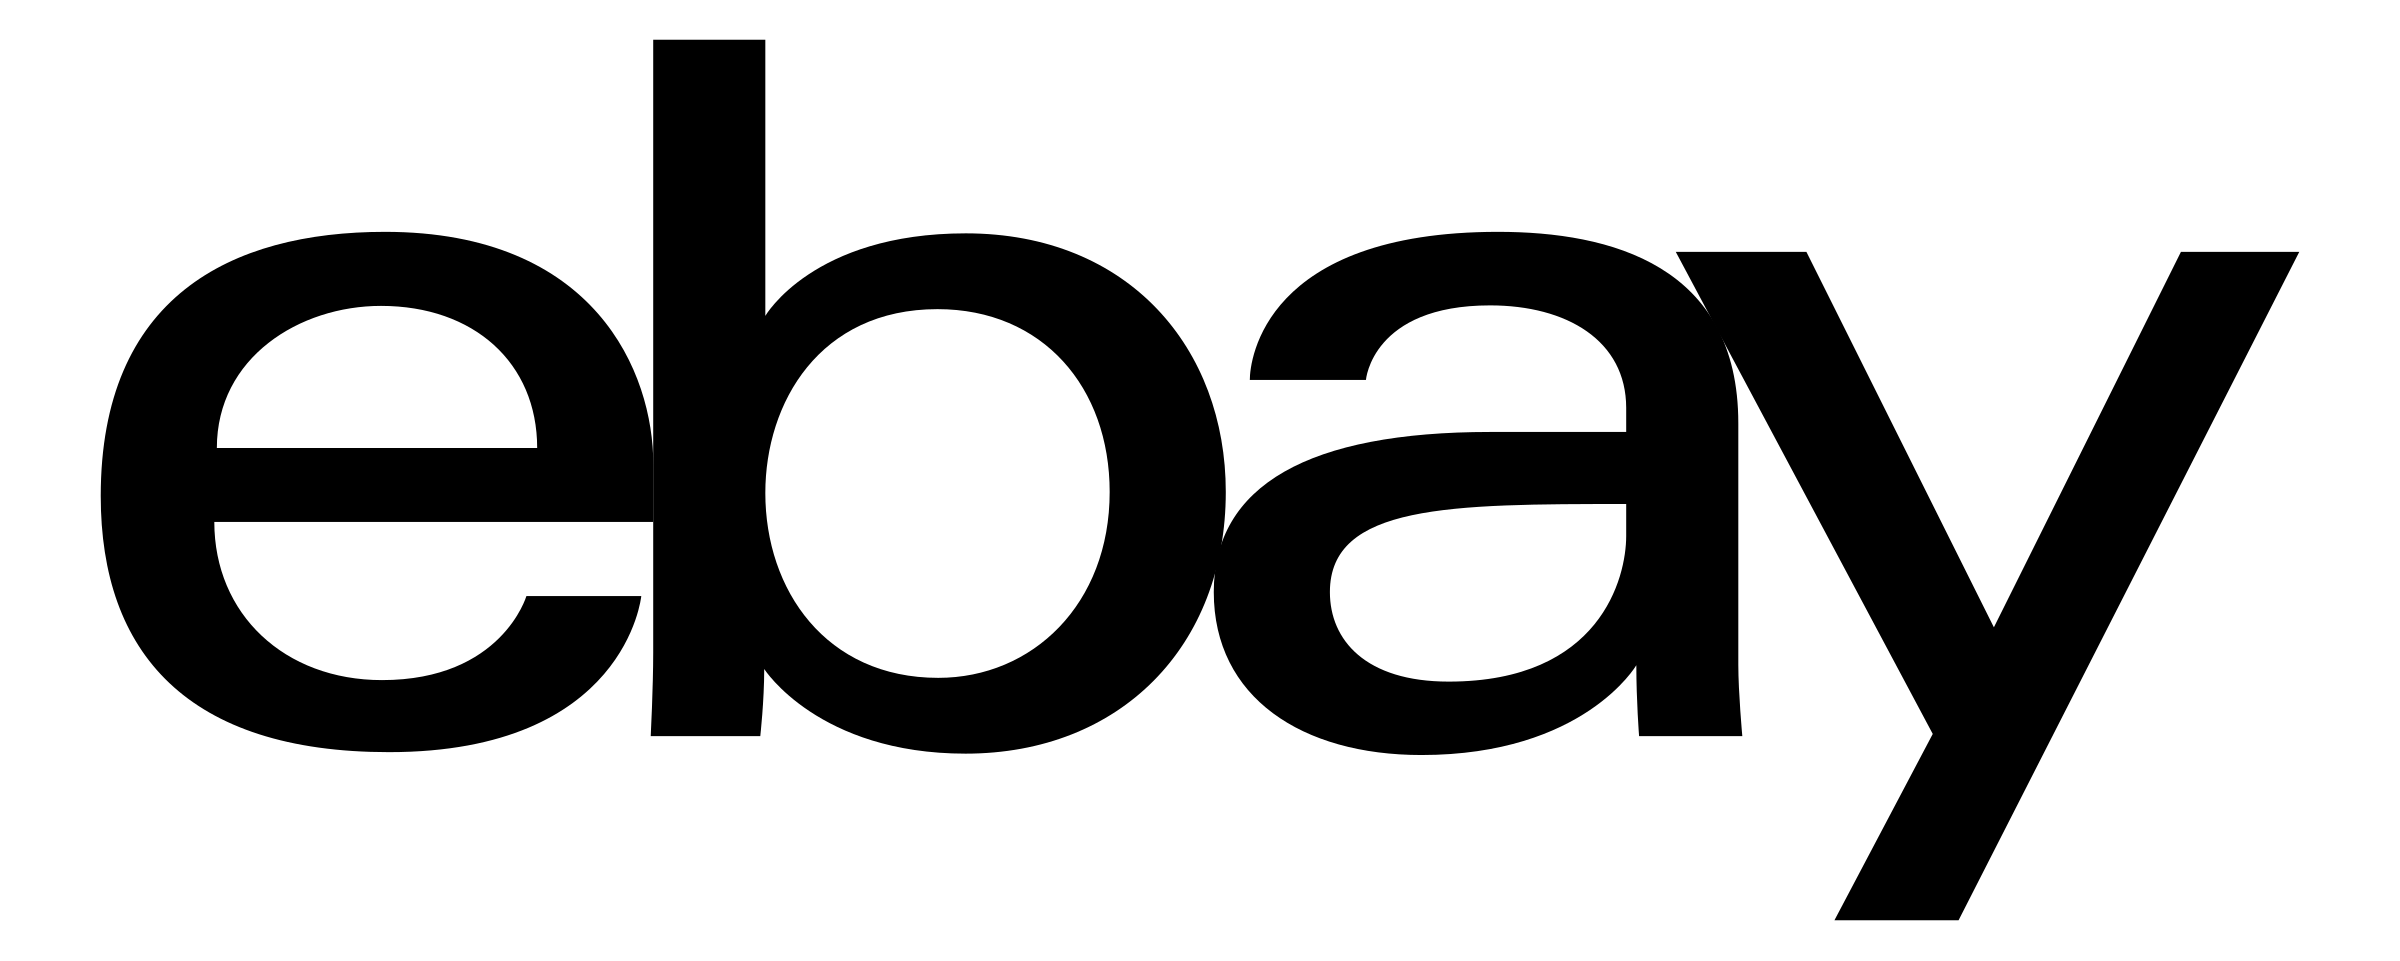 eBay Logo Black - Ebay Vector PNG